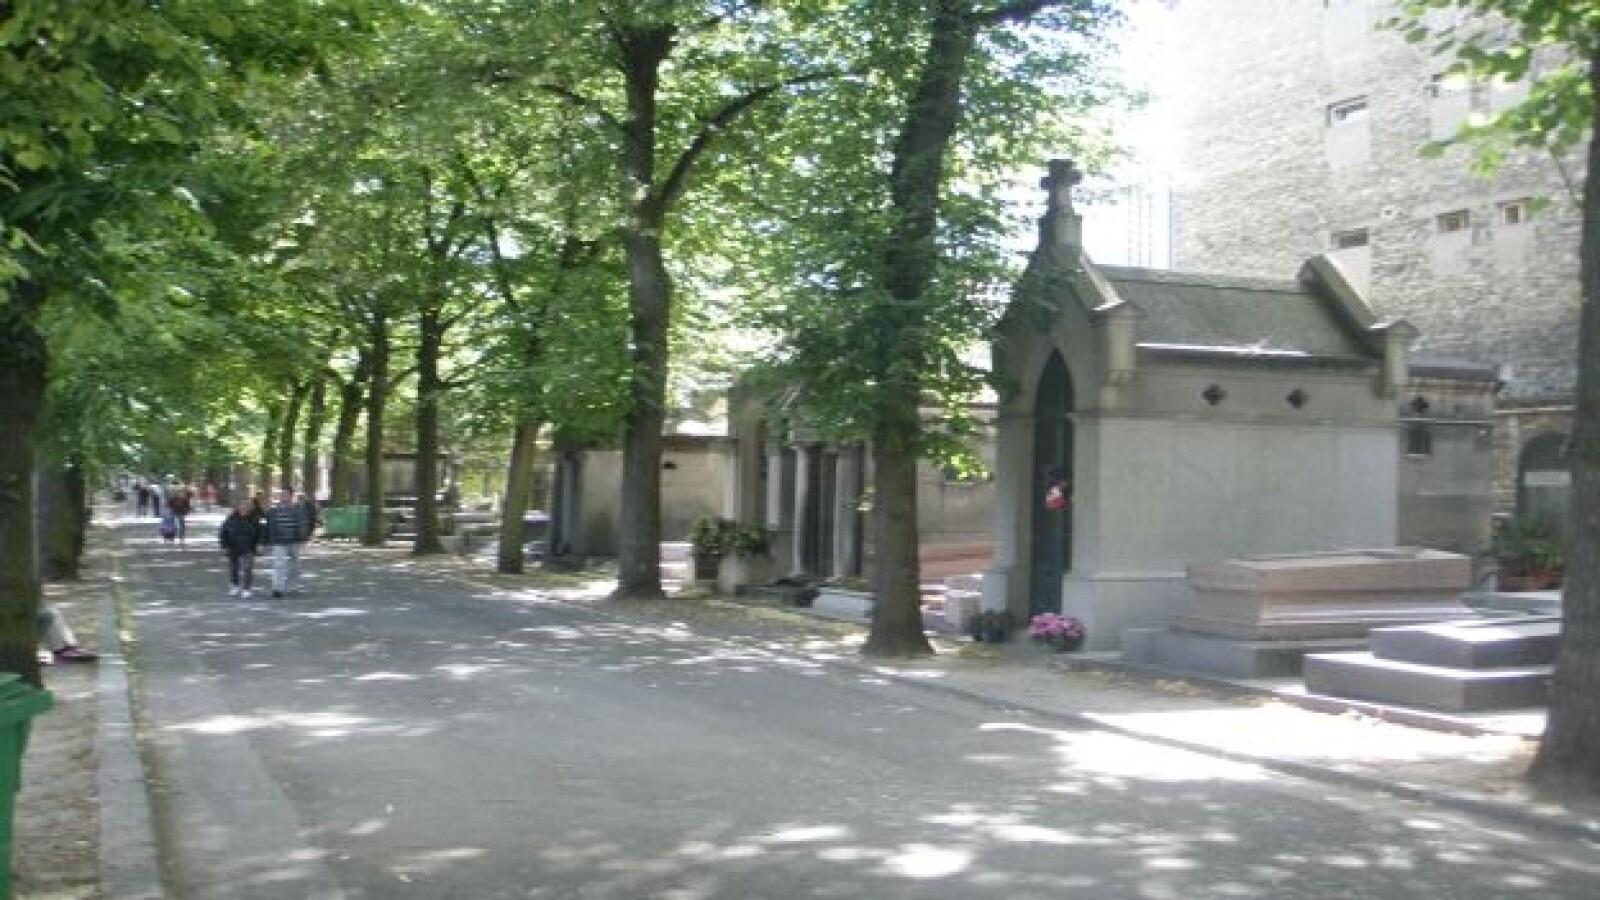 PD Alrededores tumba  Porfirio Diaz Paris 7